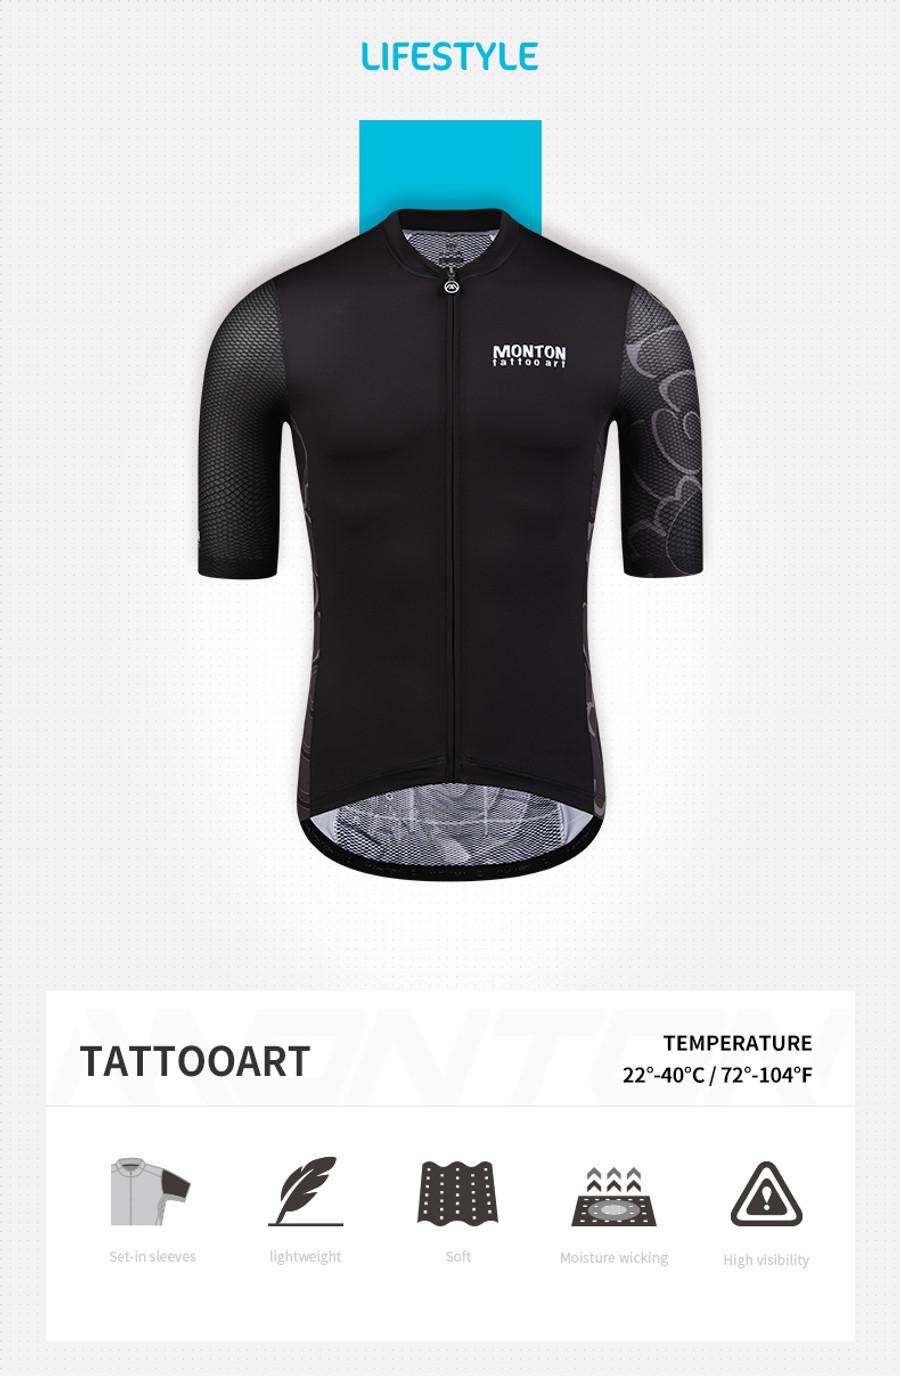 Men's Lifestyle Tattoo Art Jersey - black